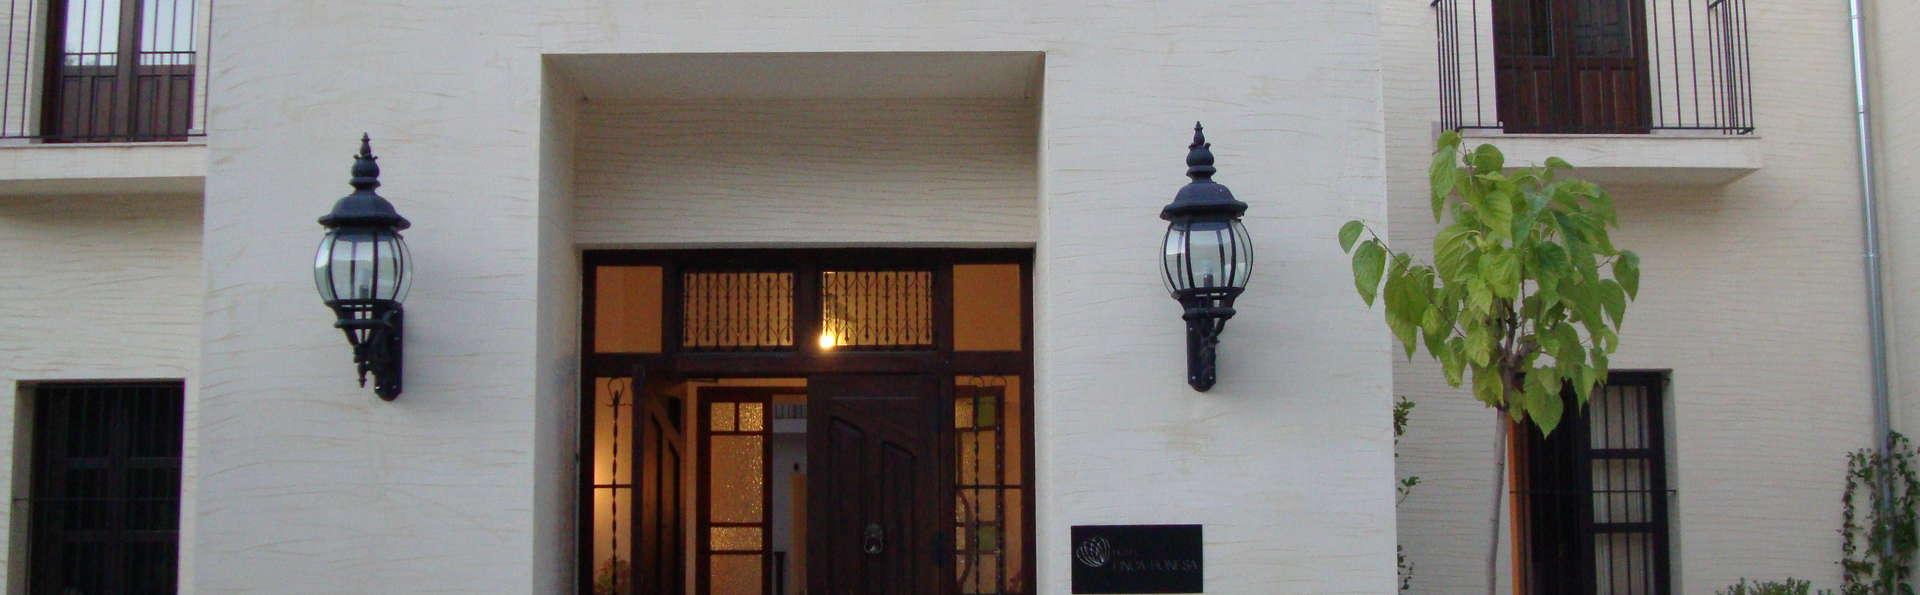 Hotel Finca Ronesa - Frente